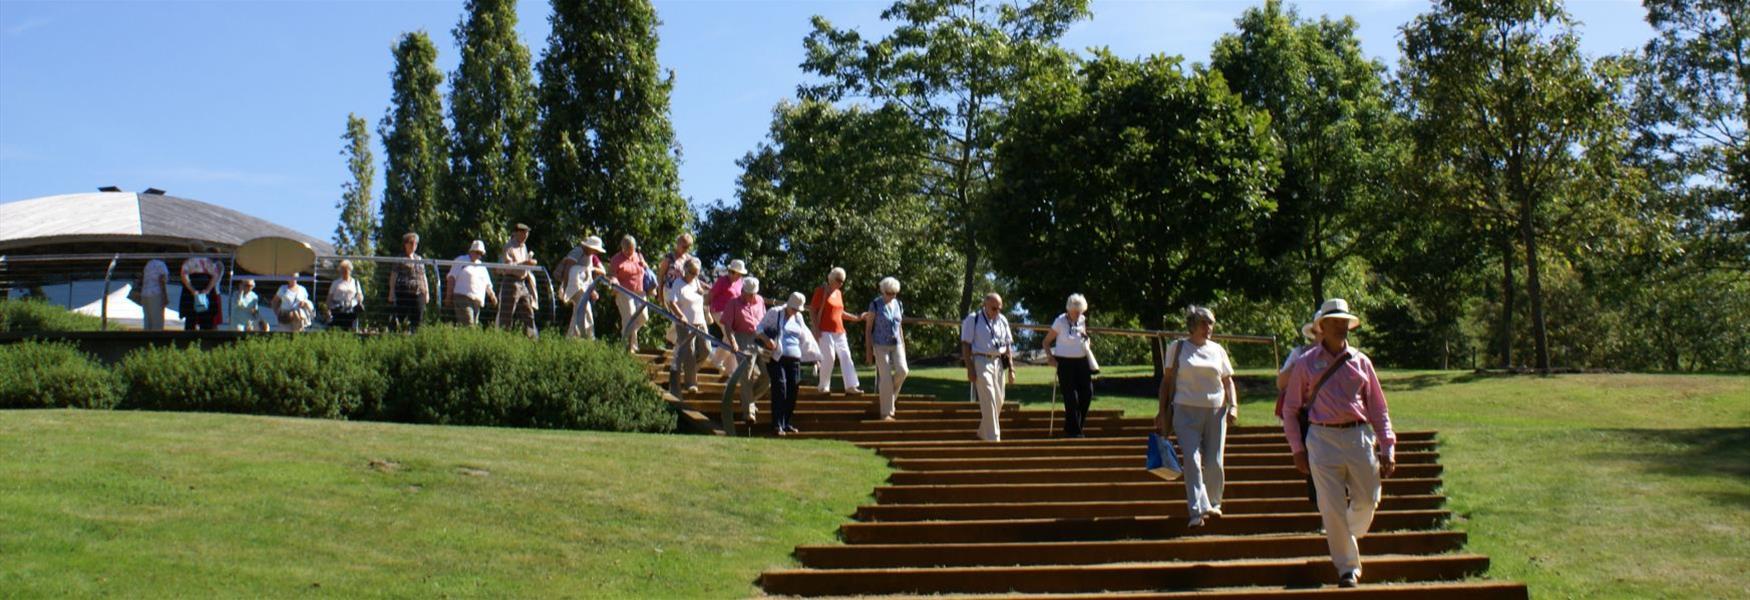 Group visiting The Savill Garden